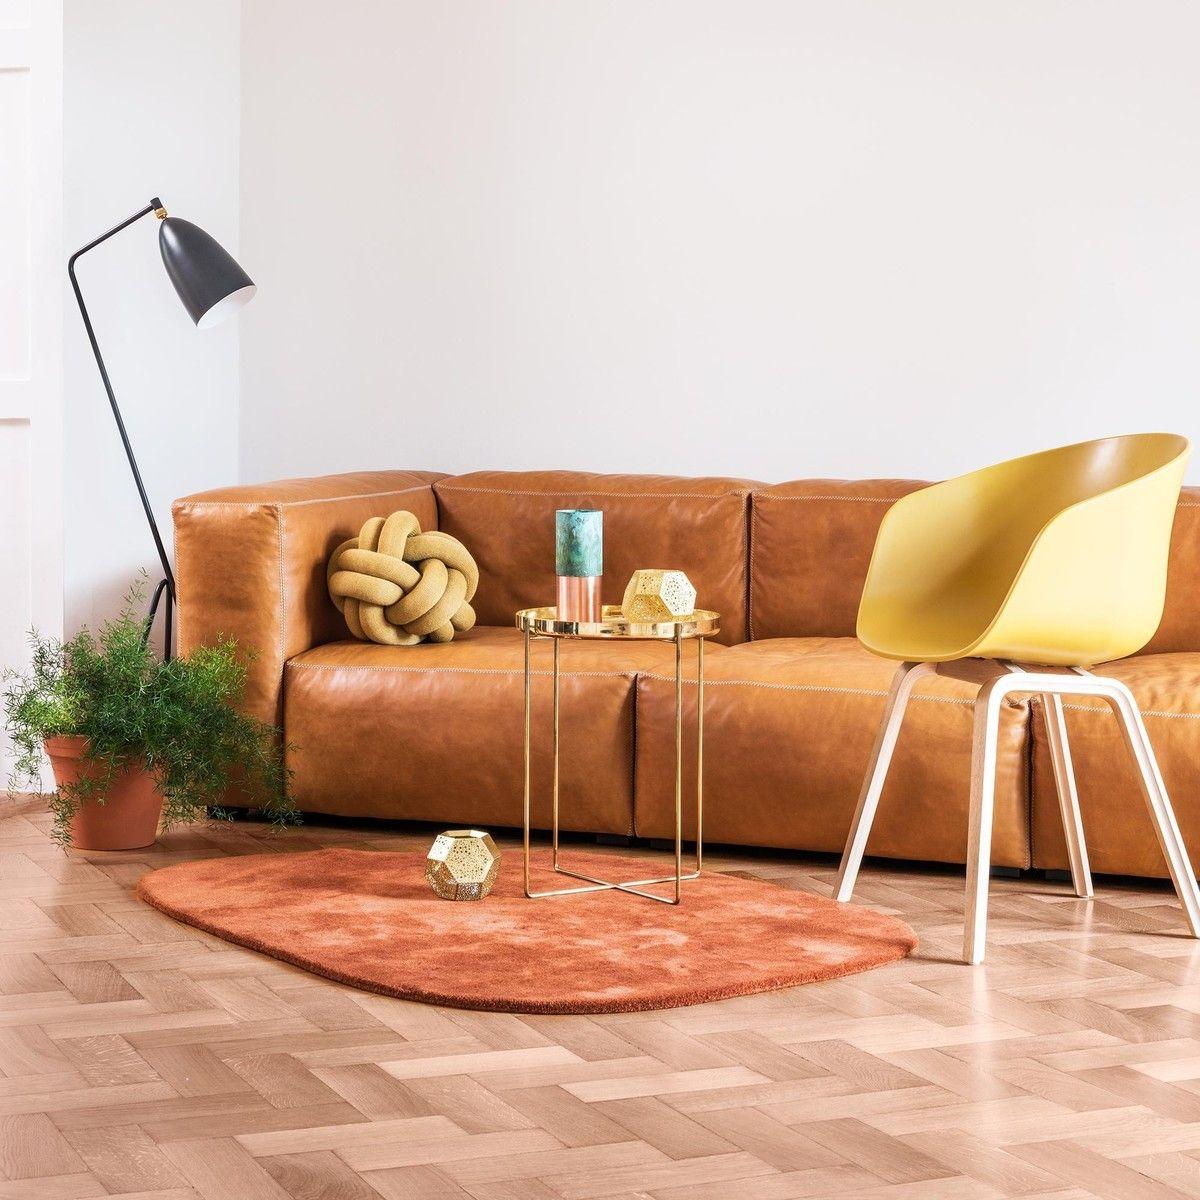 hay mags soft sofa bank jual tanpa sandaran 3 seater leather home sweet